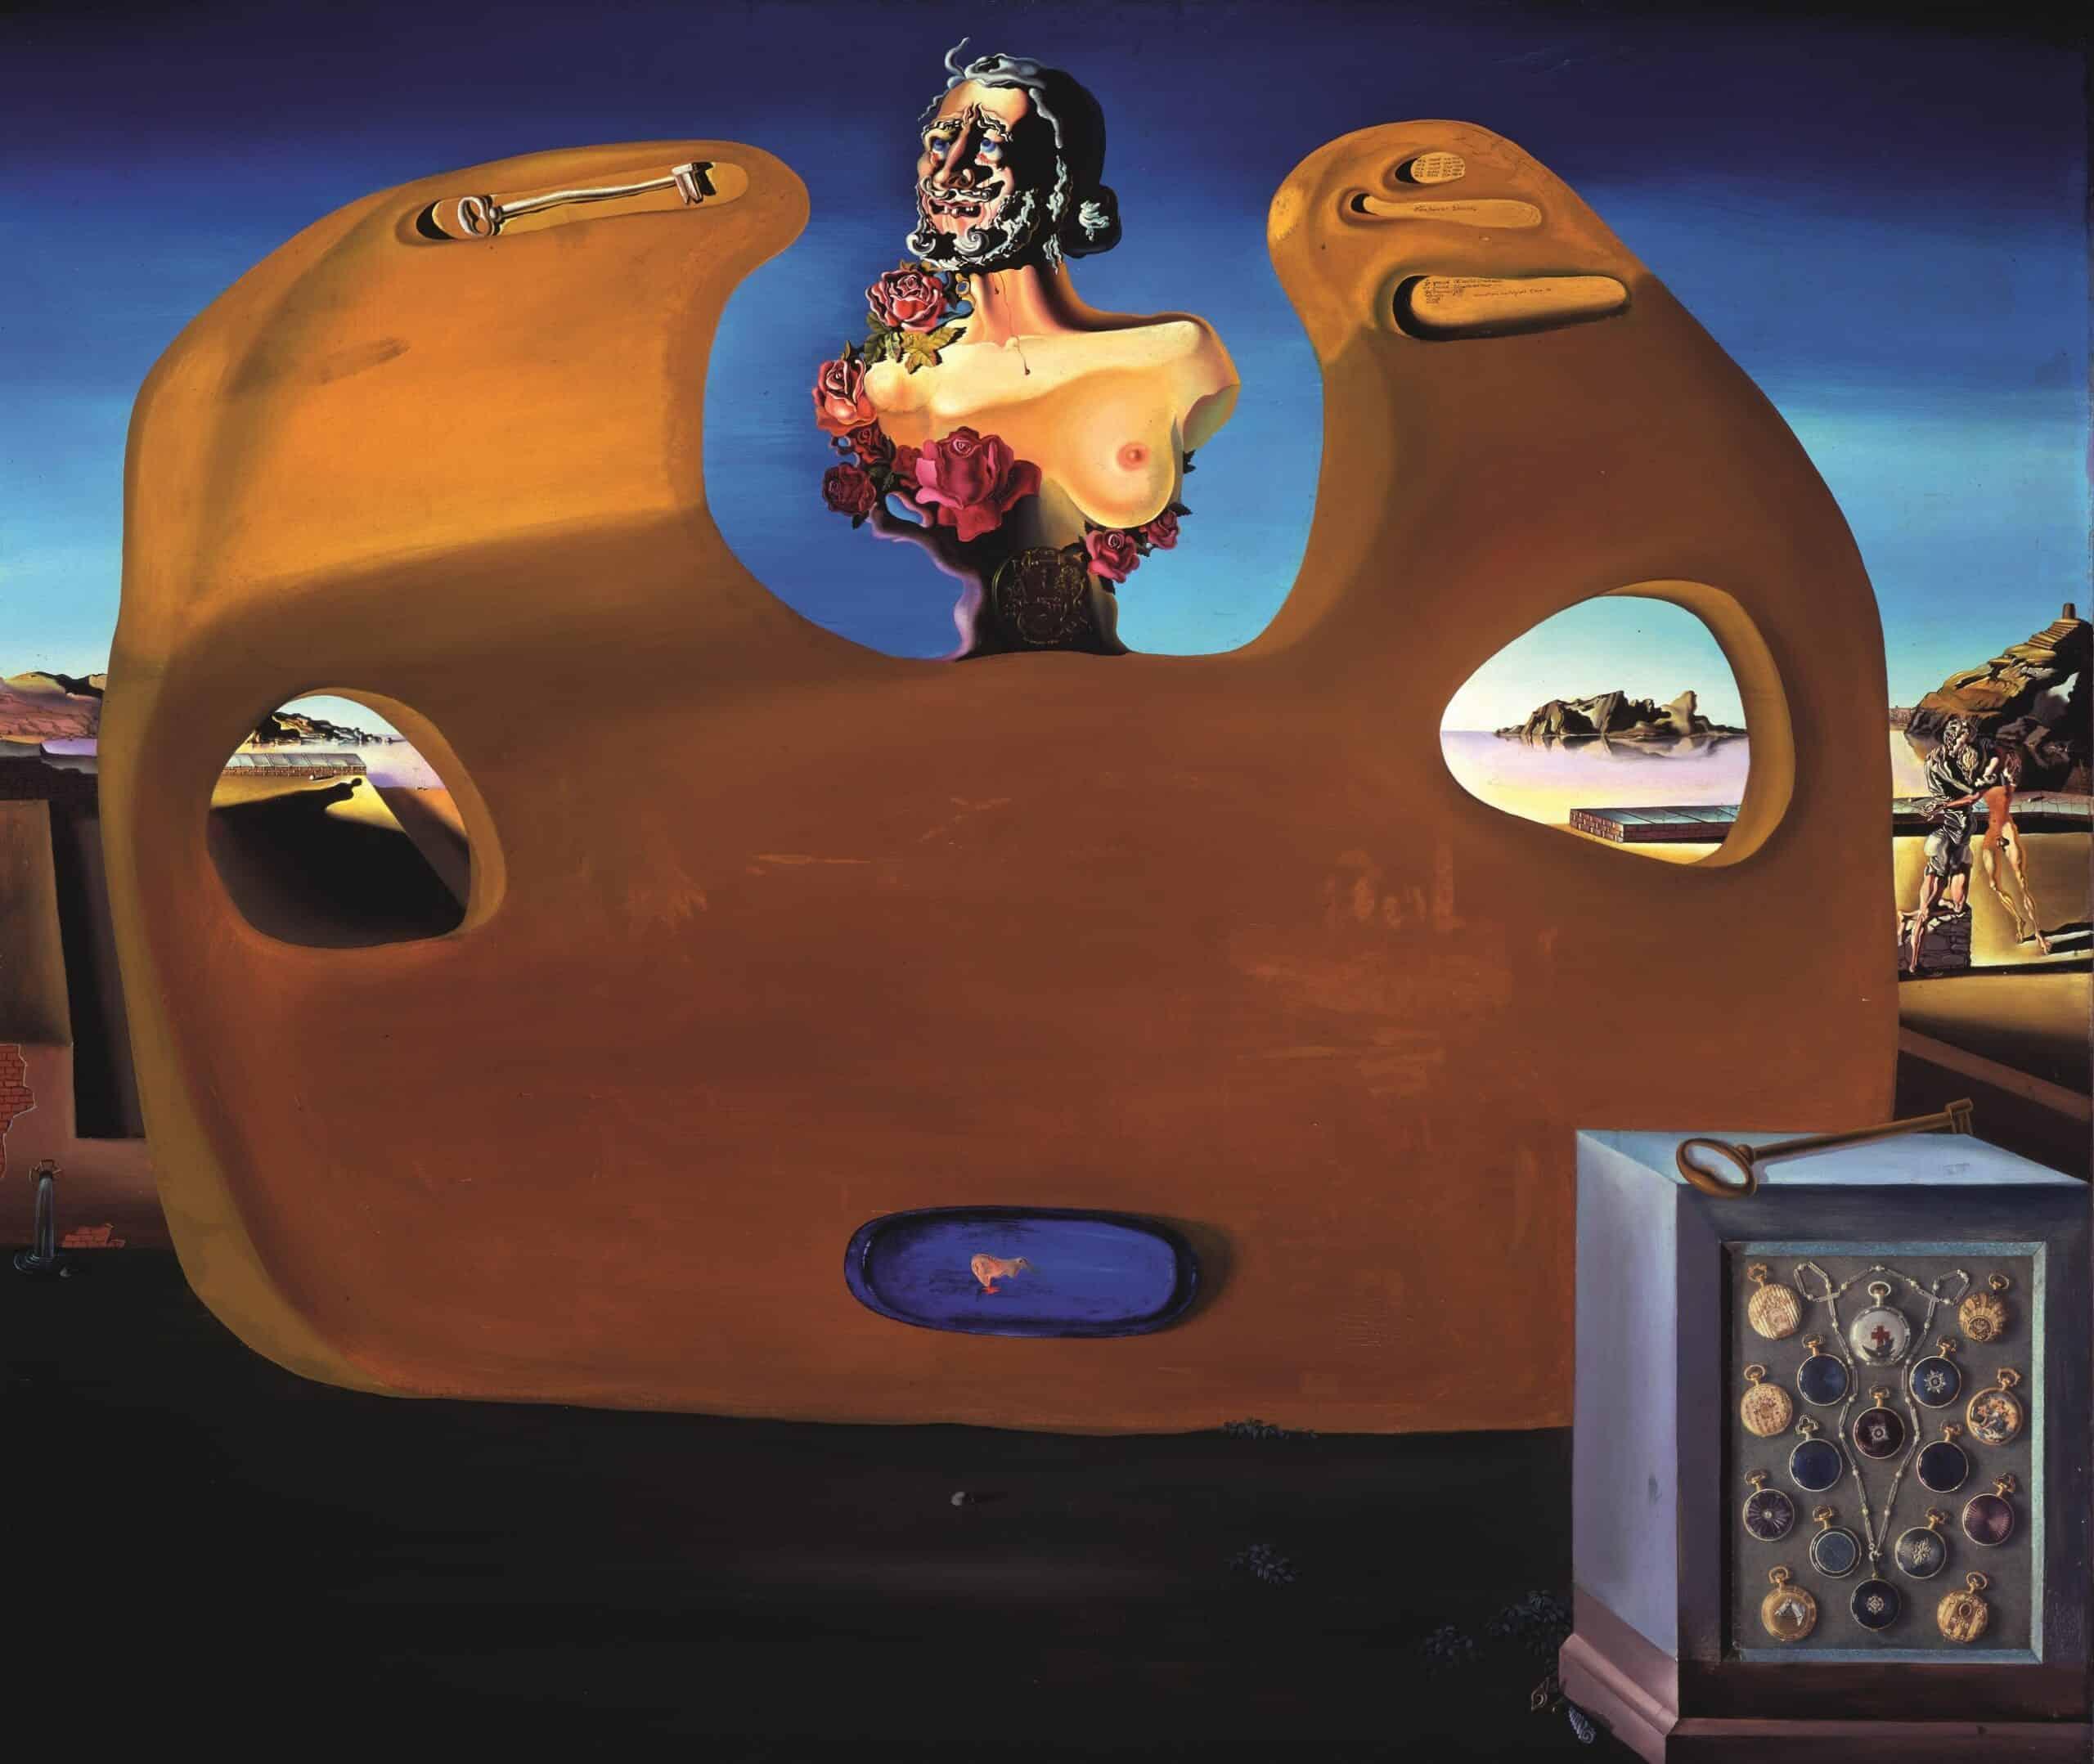 Salvador DALÍ Memory of the Child-Woman La mémoire de la femme-enfant De herinnering aan het vrouw-kind Ca. 1931 Oil and collage on canvas 99 x 120.65 cm Collection of The Dali Museum, St. Petersburg FL © Salvador Dalí, Fundació Gala-Salvador Dalí, (corresponding Rights Society), 2019